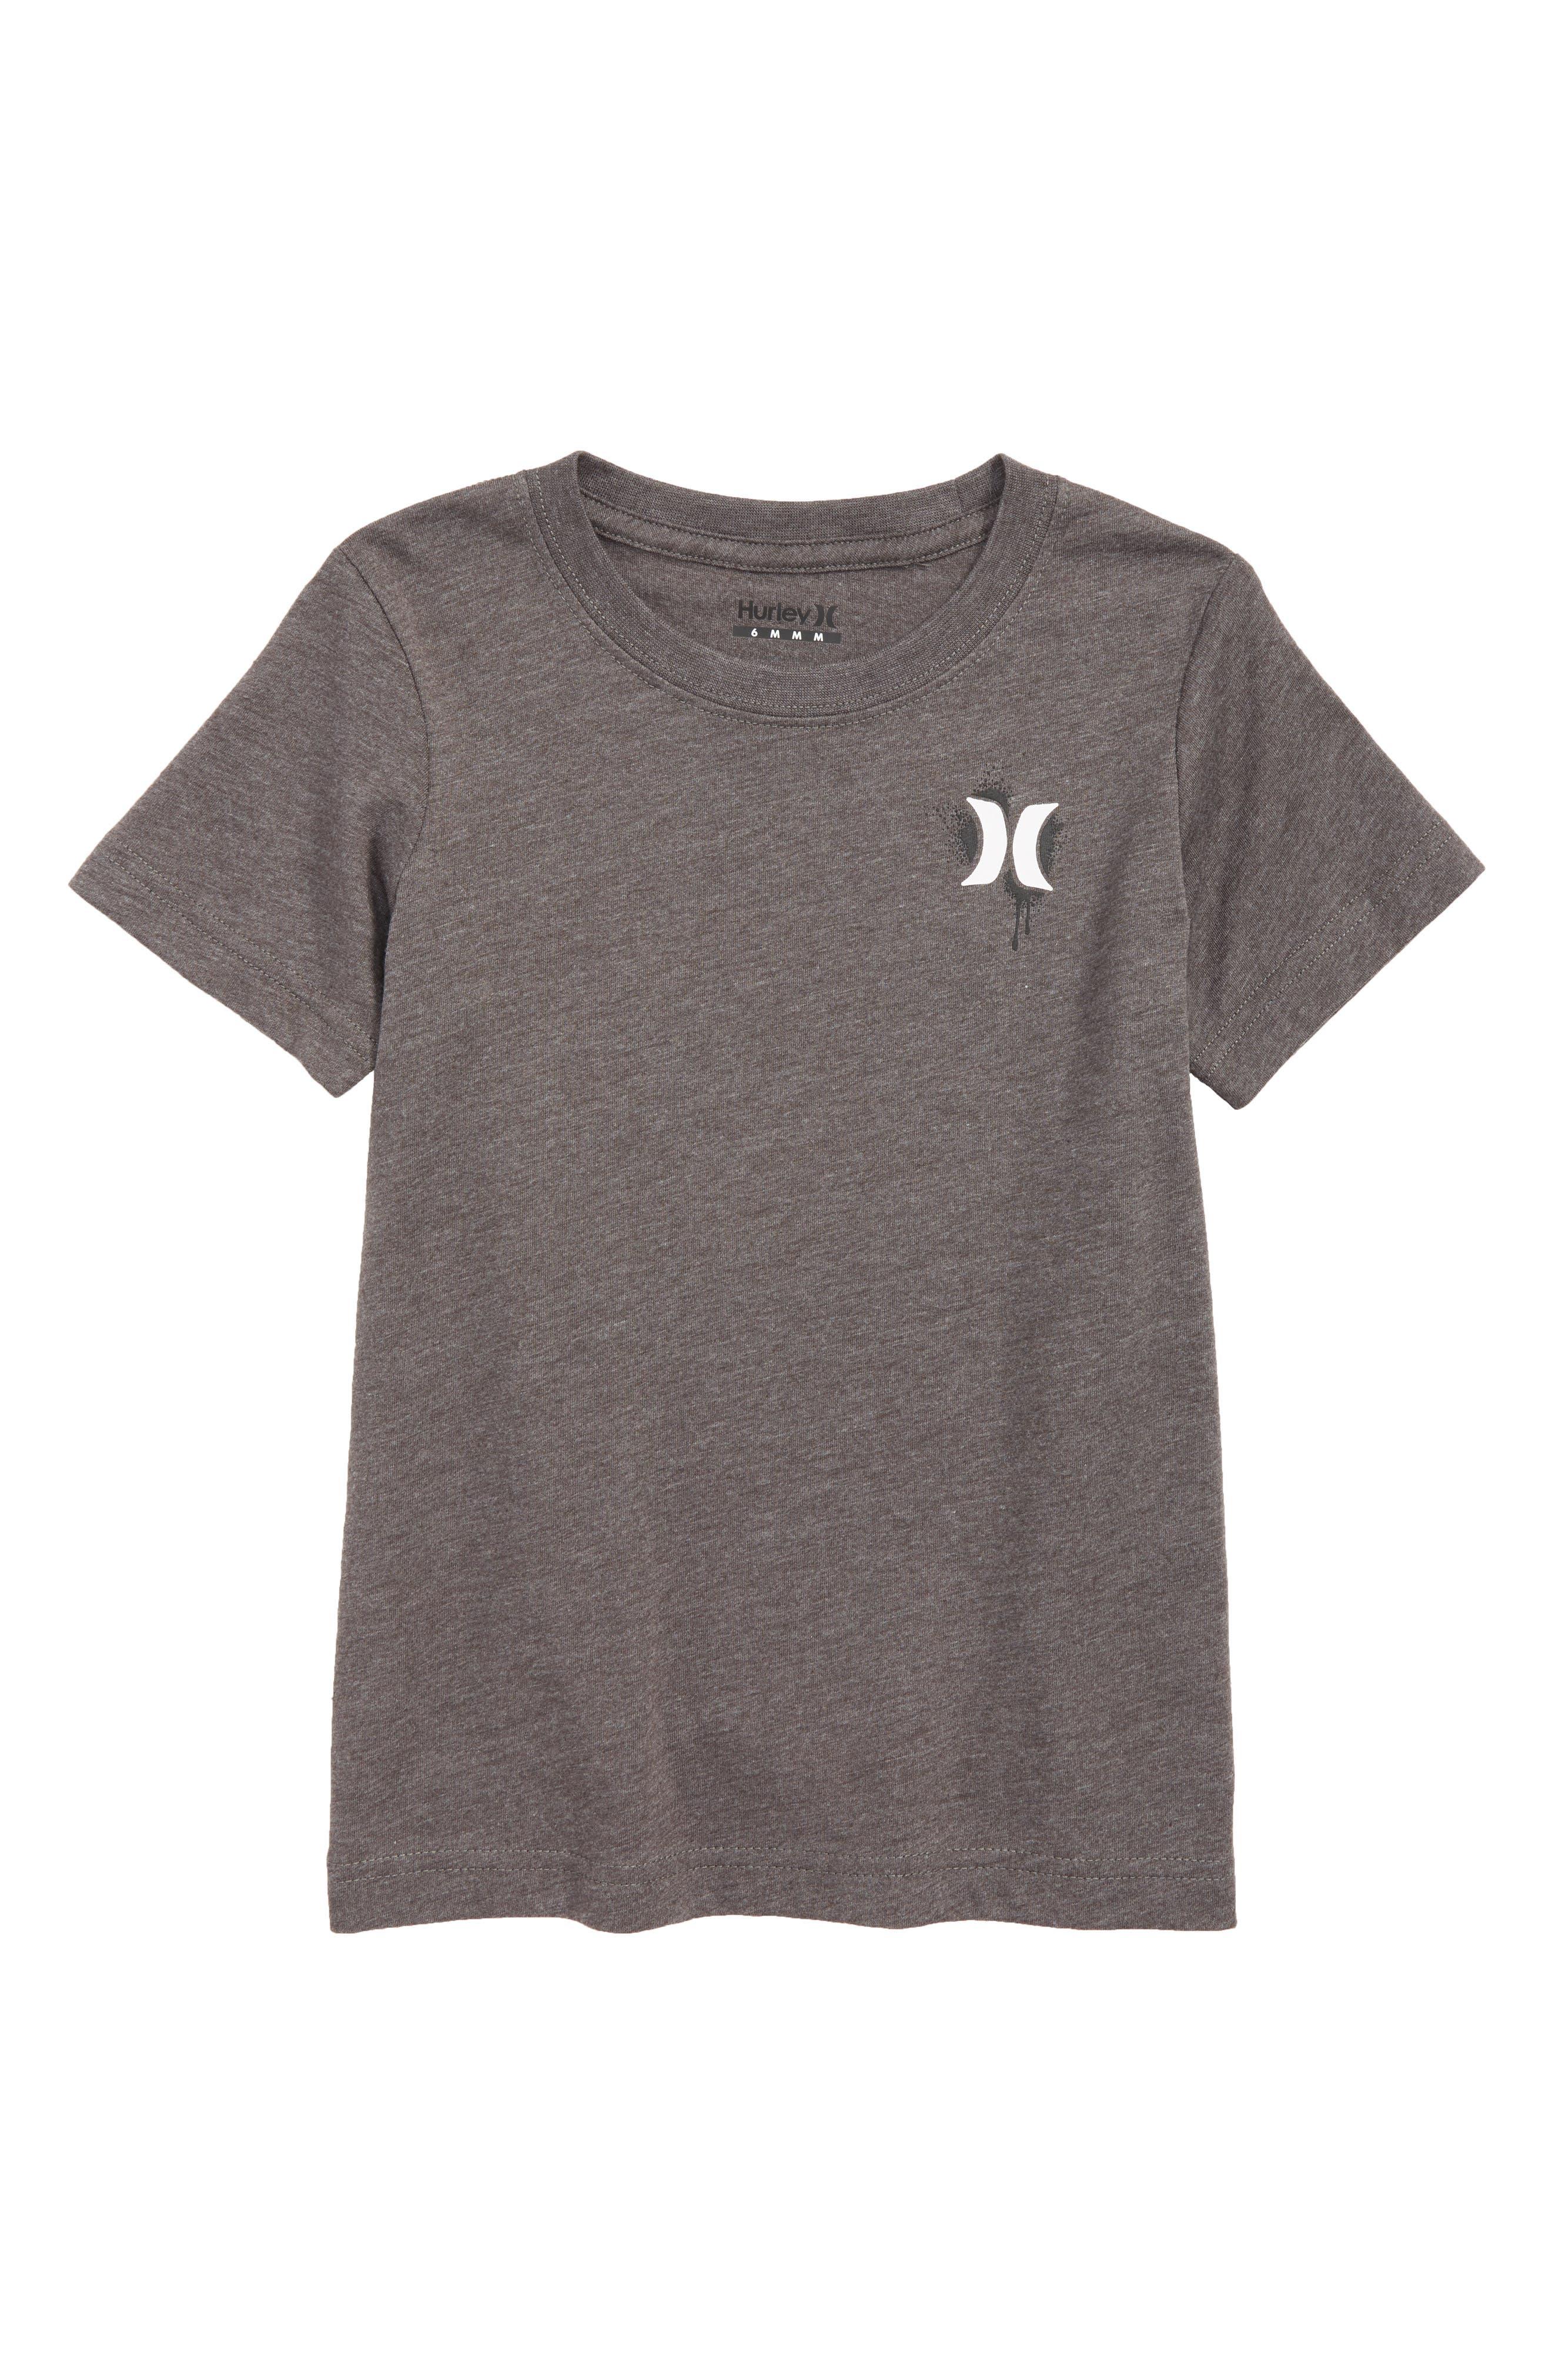 Shark T-Shirt,                             Main thumbnail 1, color,                             CHARCOAL HEATHER